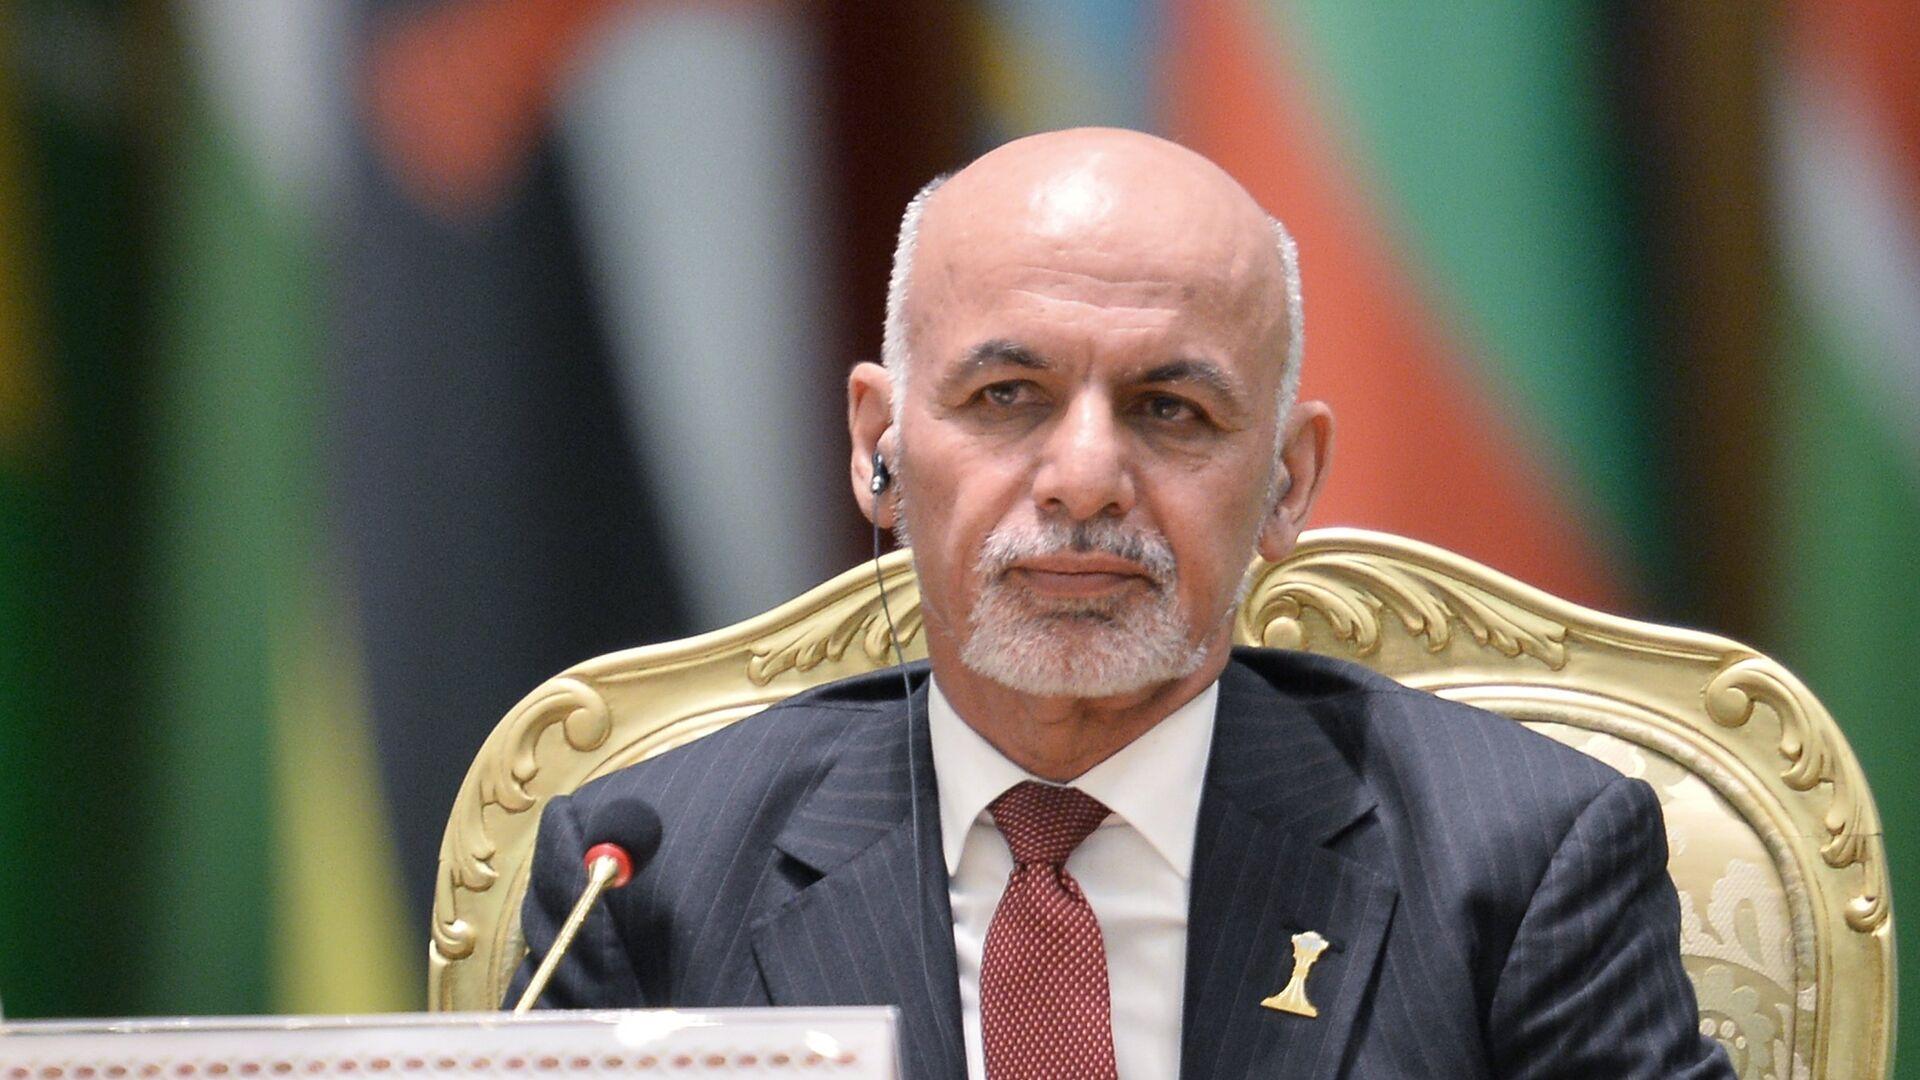 Prezident Afganistana Moxammad Ashraf Gani  - Sputnik Oʻzbekiston, 1920, 14.08.2021